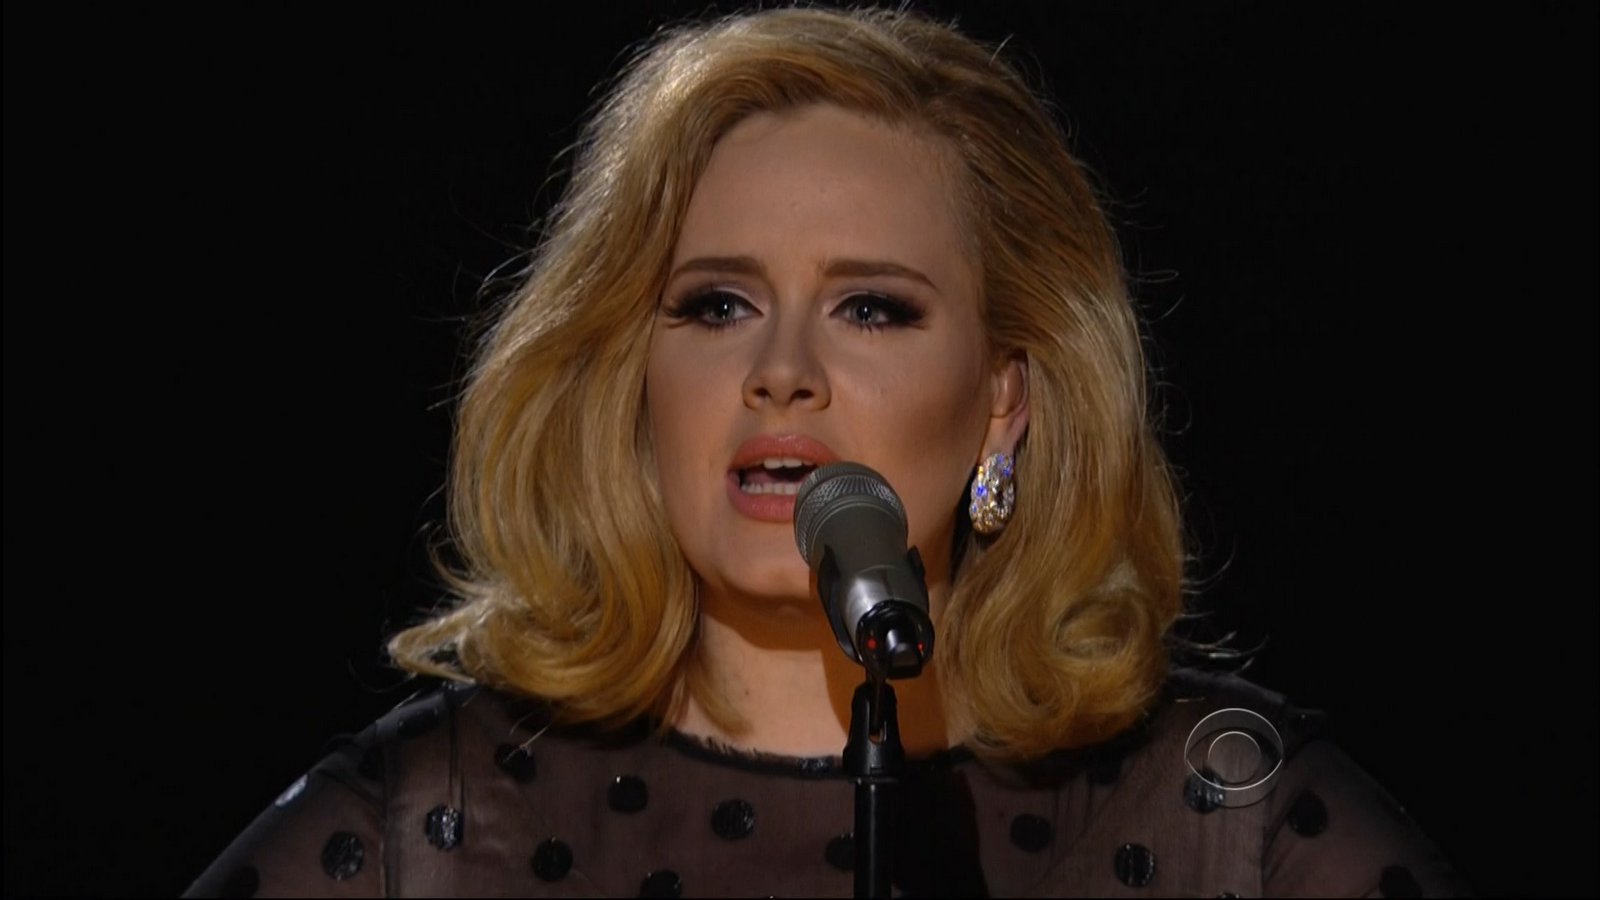 http://3.bp.blogspot.com/-FObtyovUncQ/TziA0wcTfYI/AAAAAAAAES8/1VzCfkTRB2k/s1600/Adele-Grammys.png